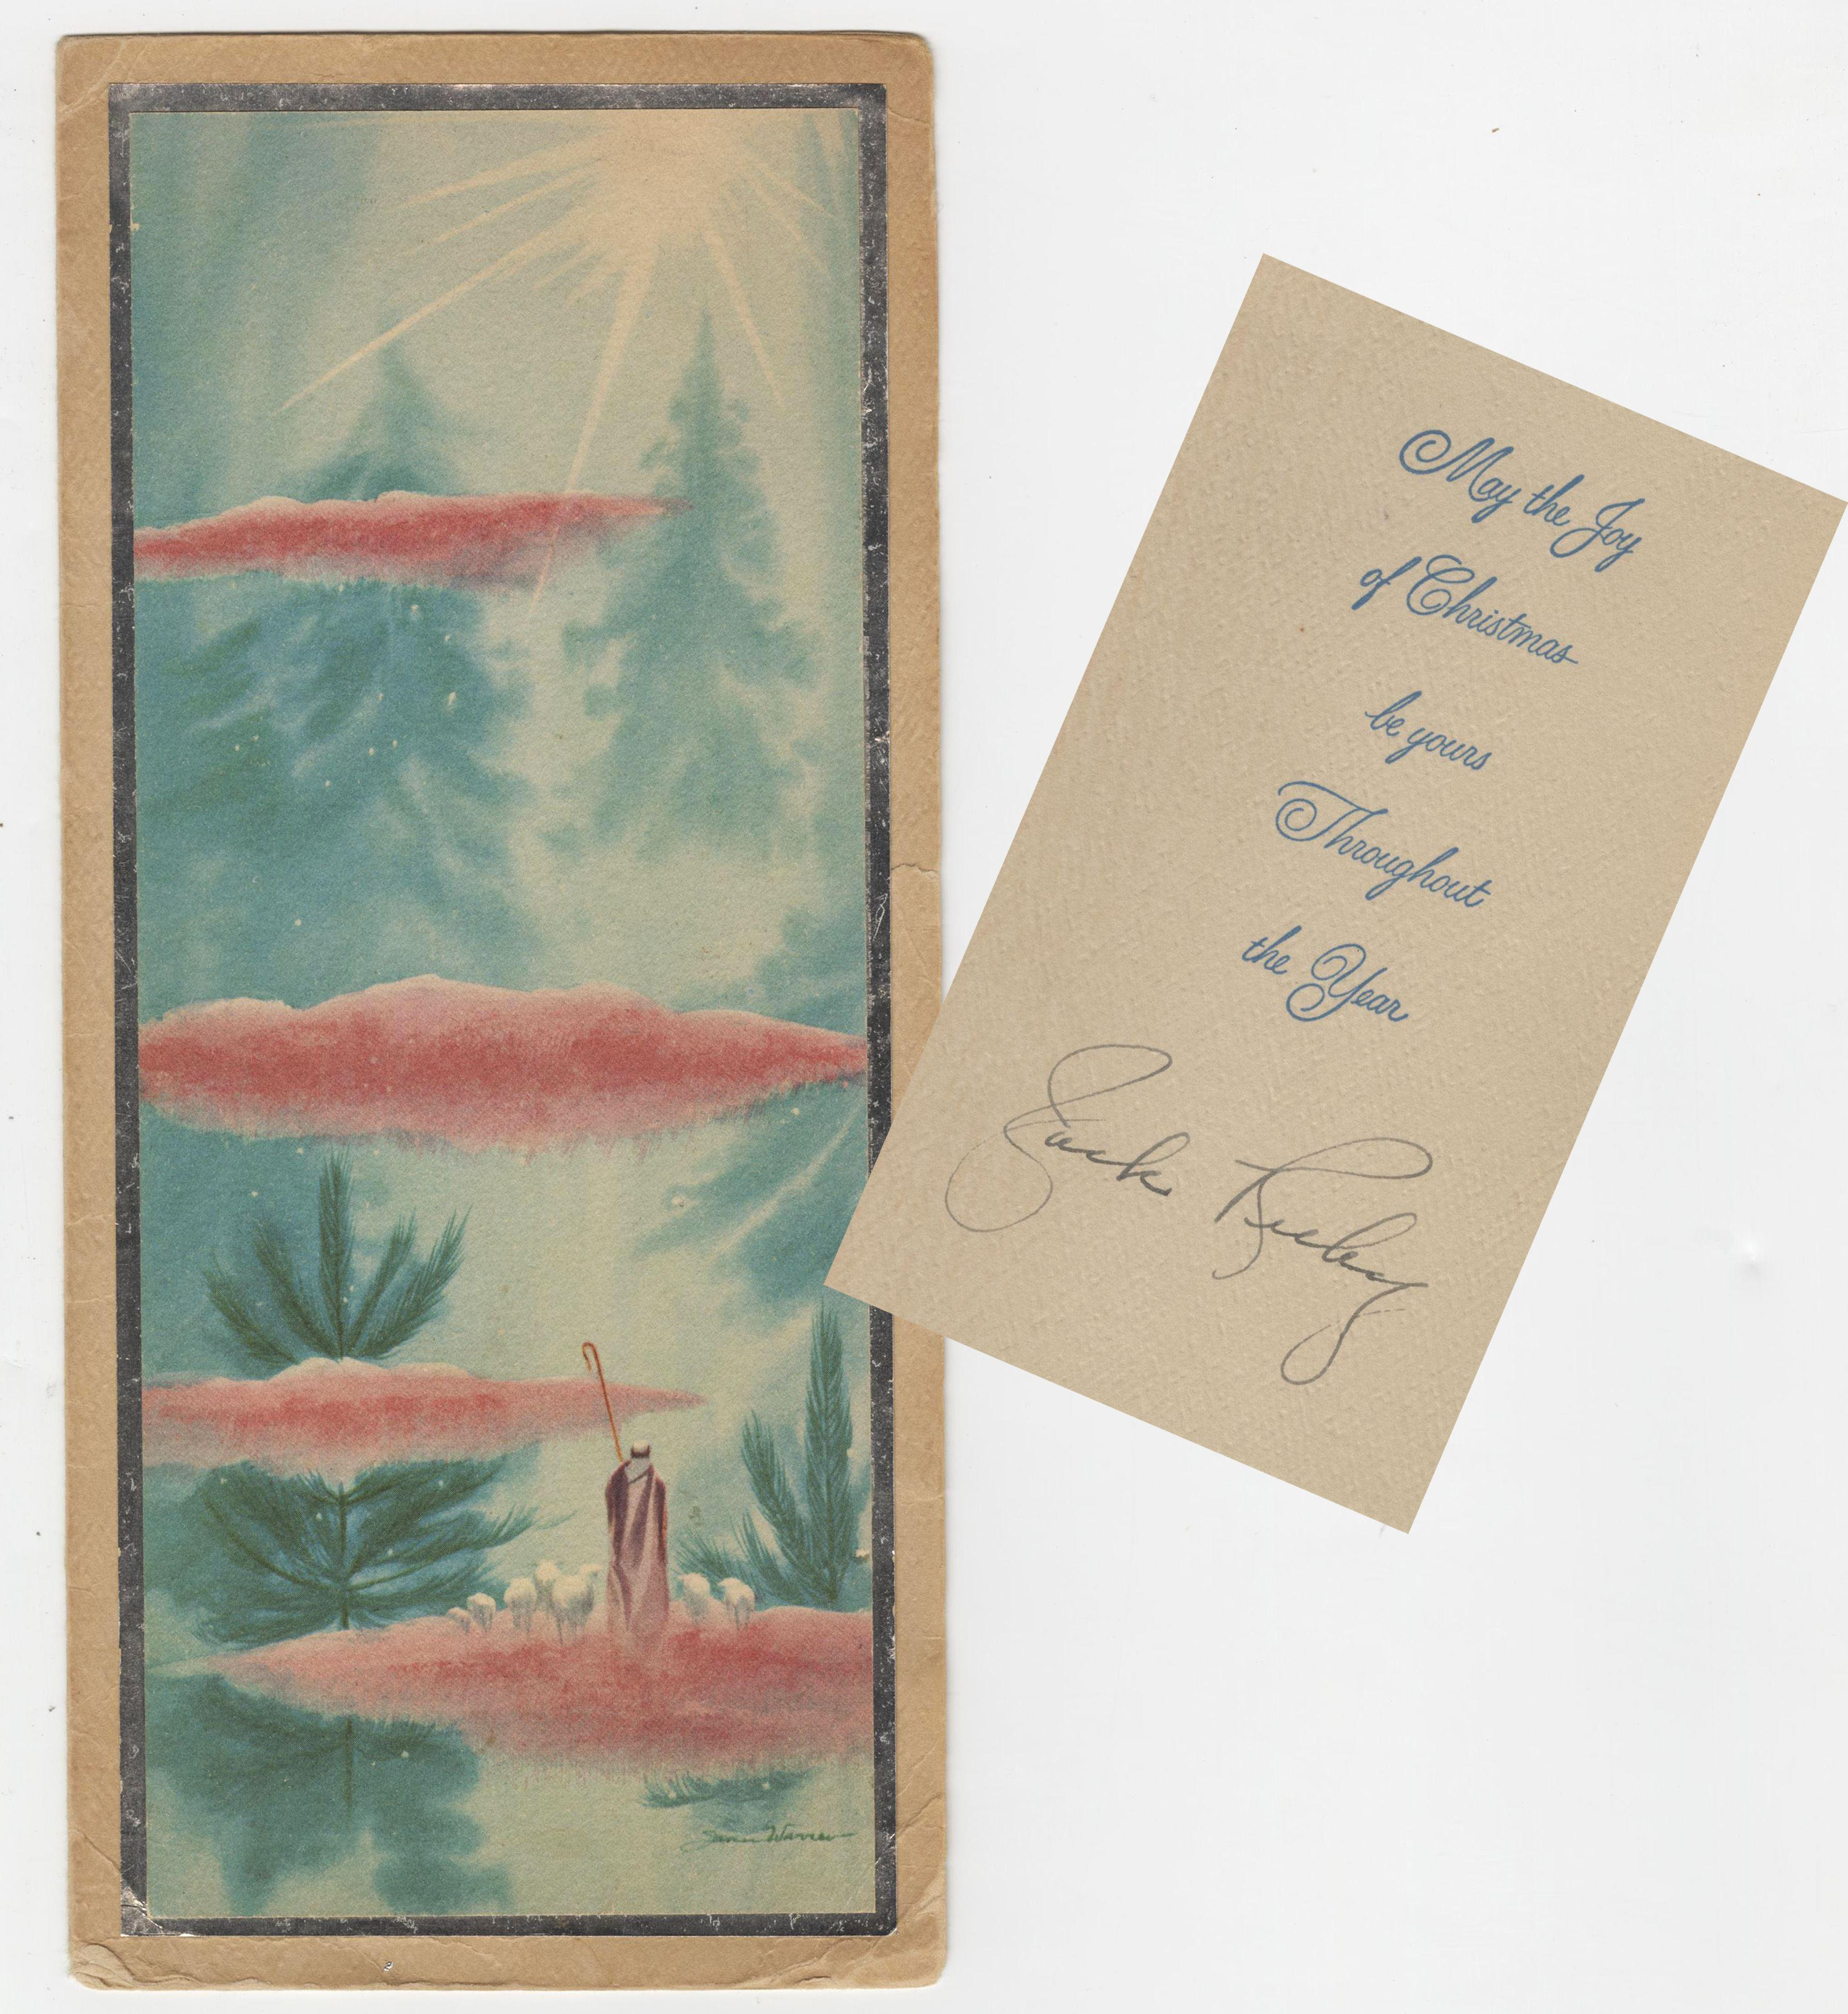 Jack Ruby Signed Christmas Card